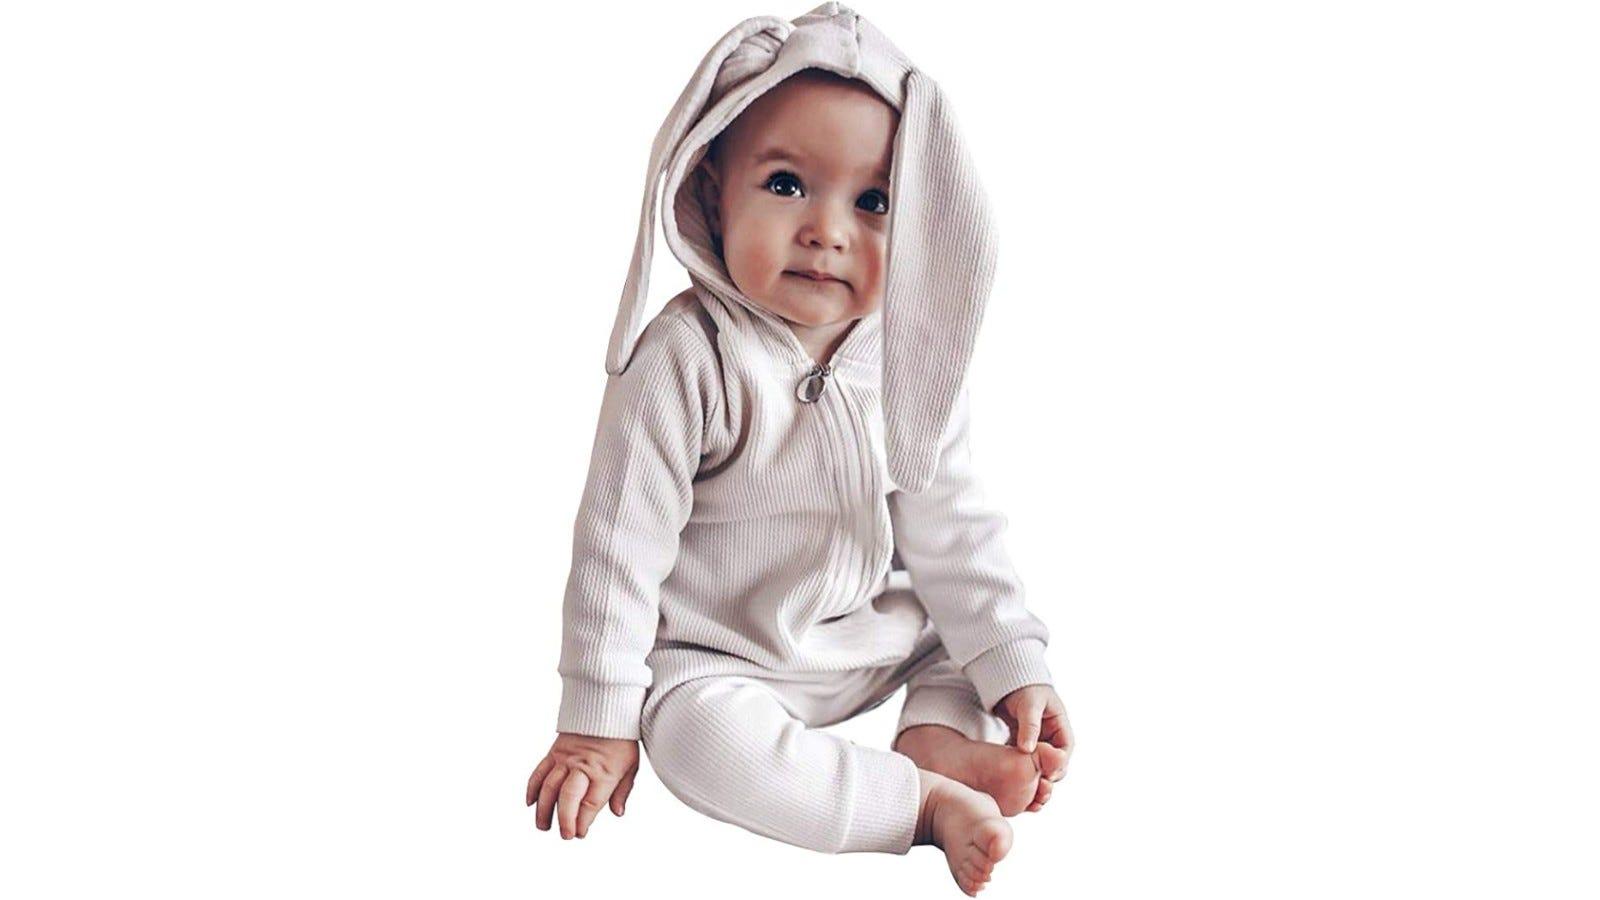 pajamas with bunny ears